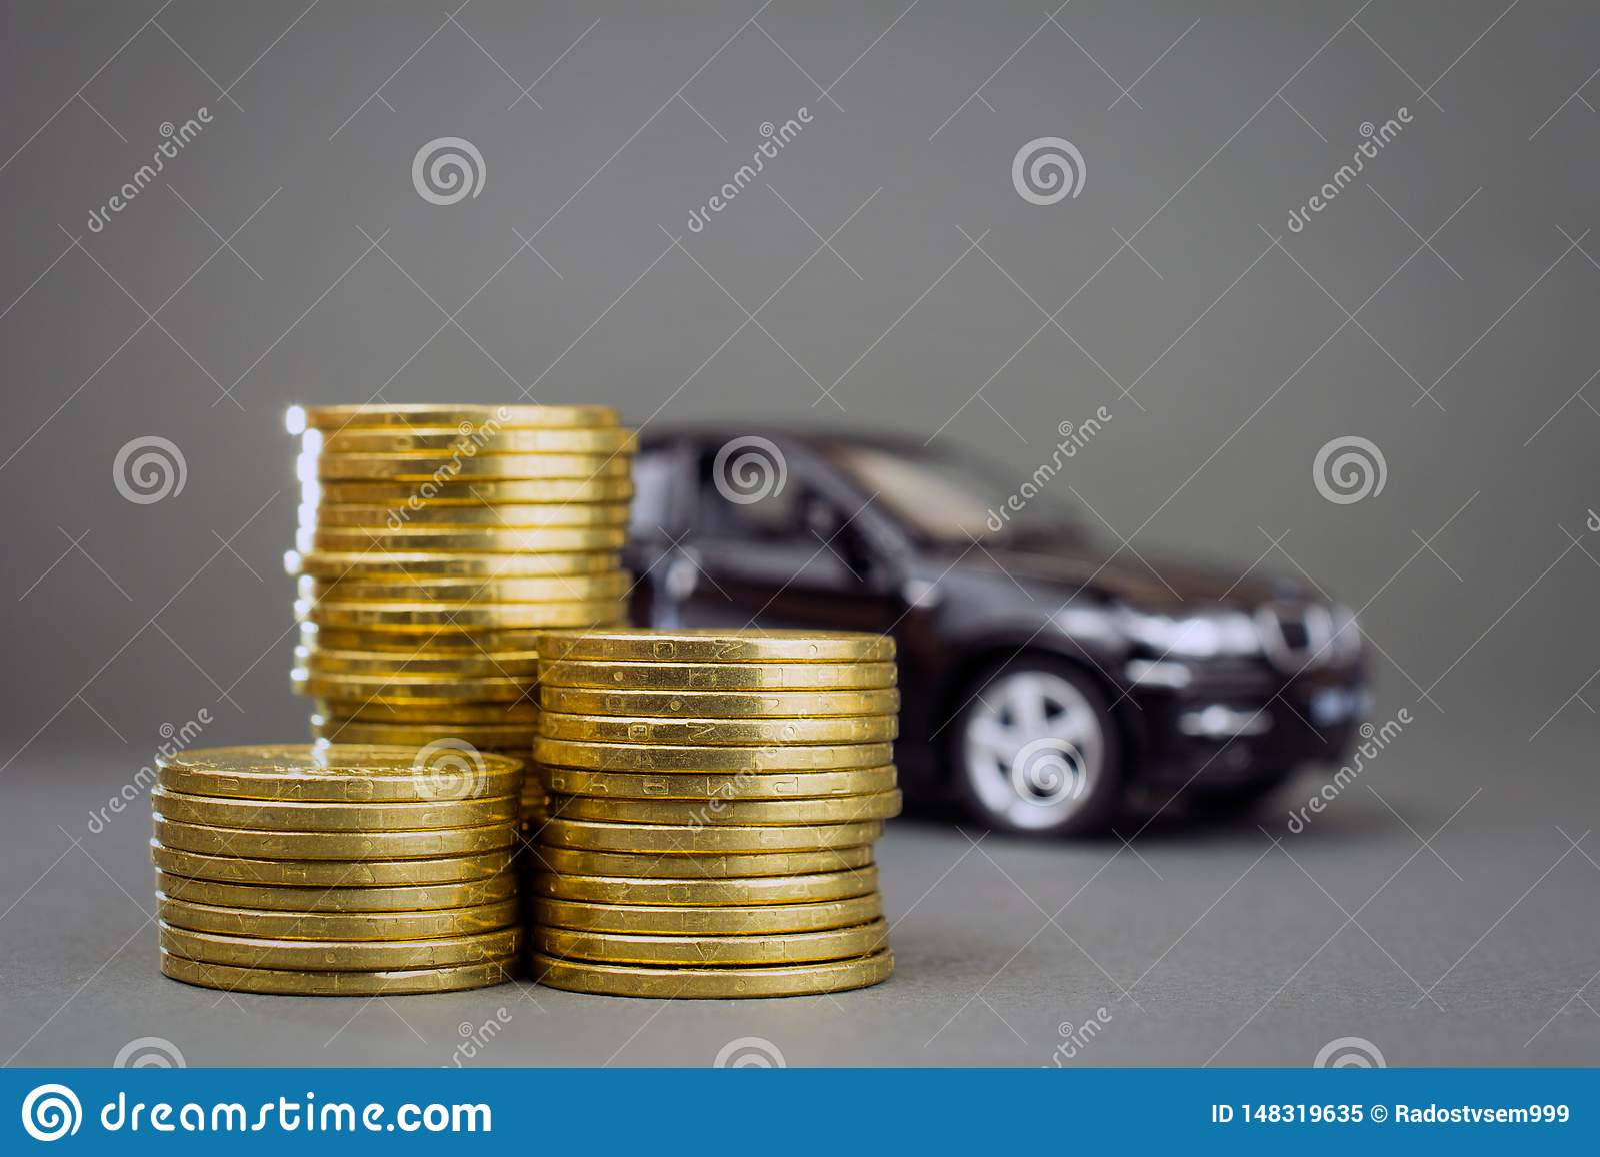 Auto dealership and rental car